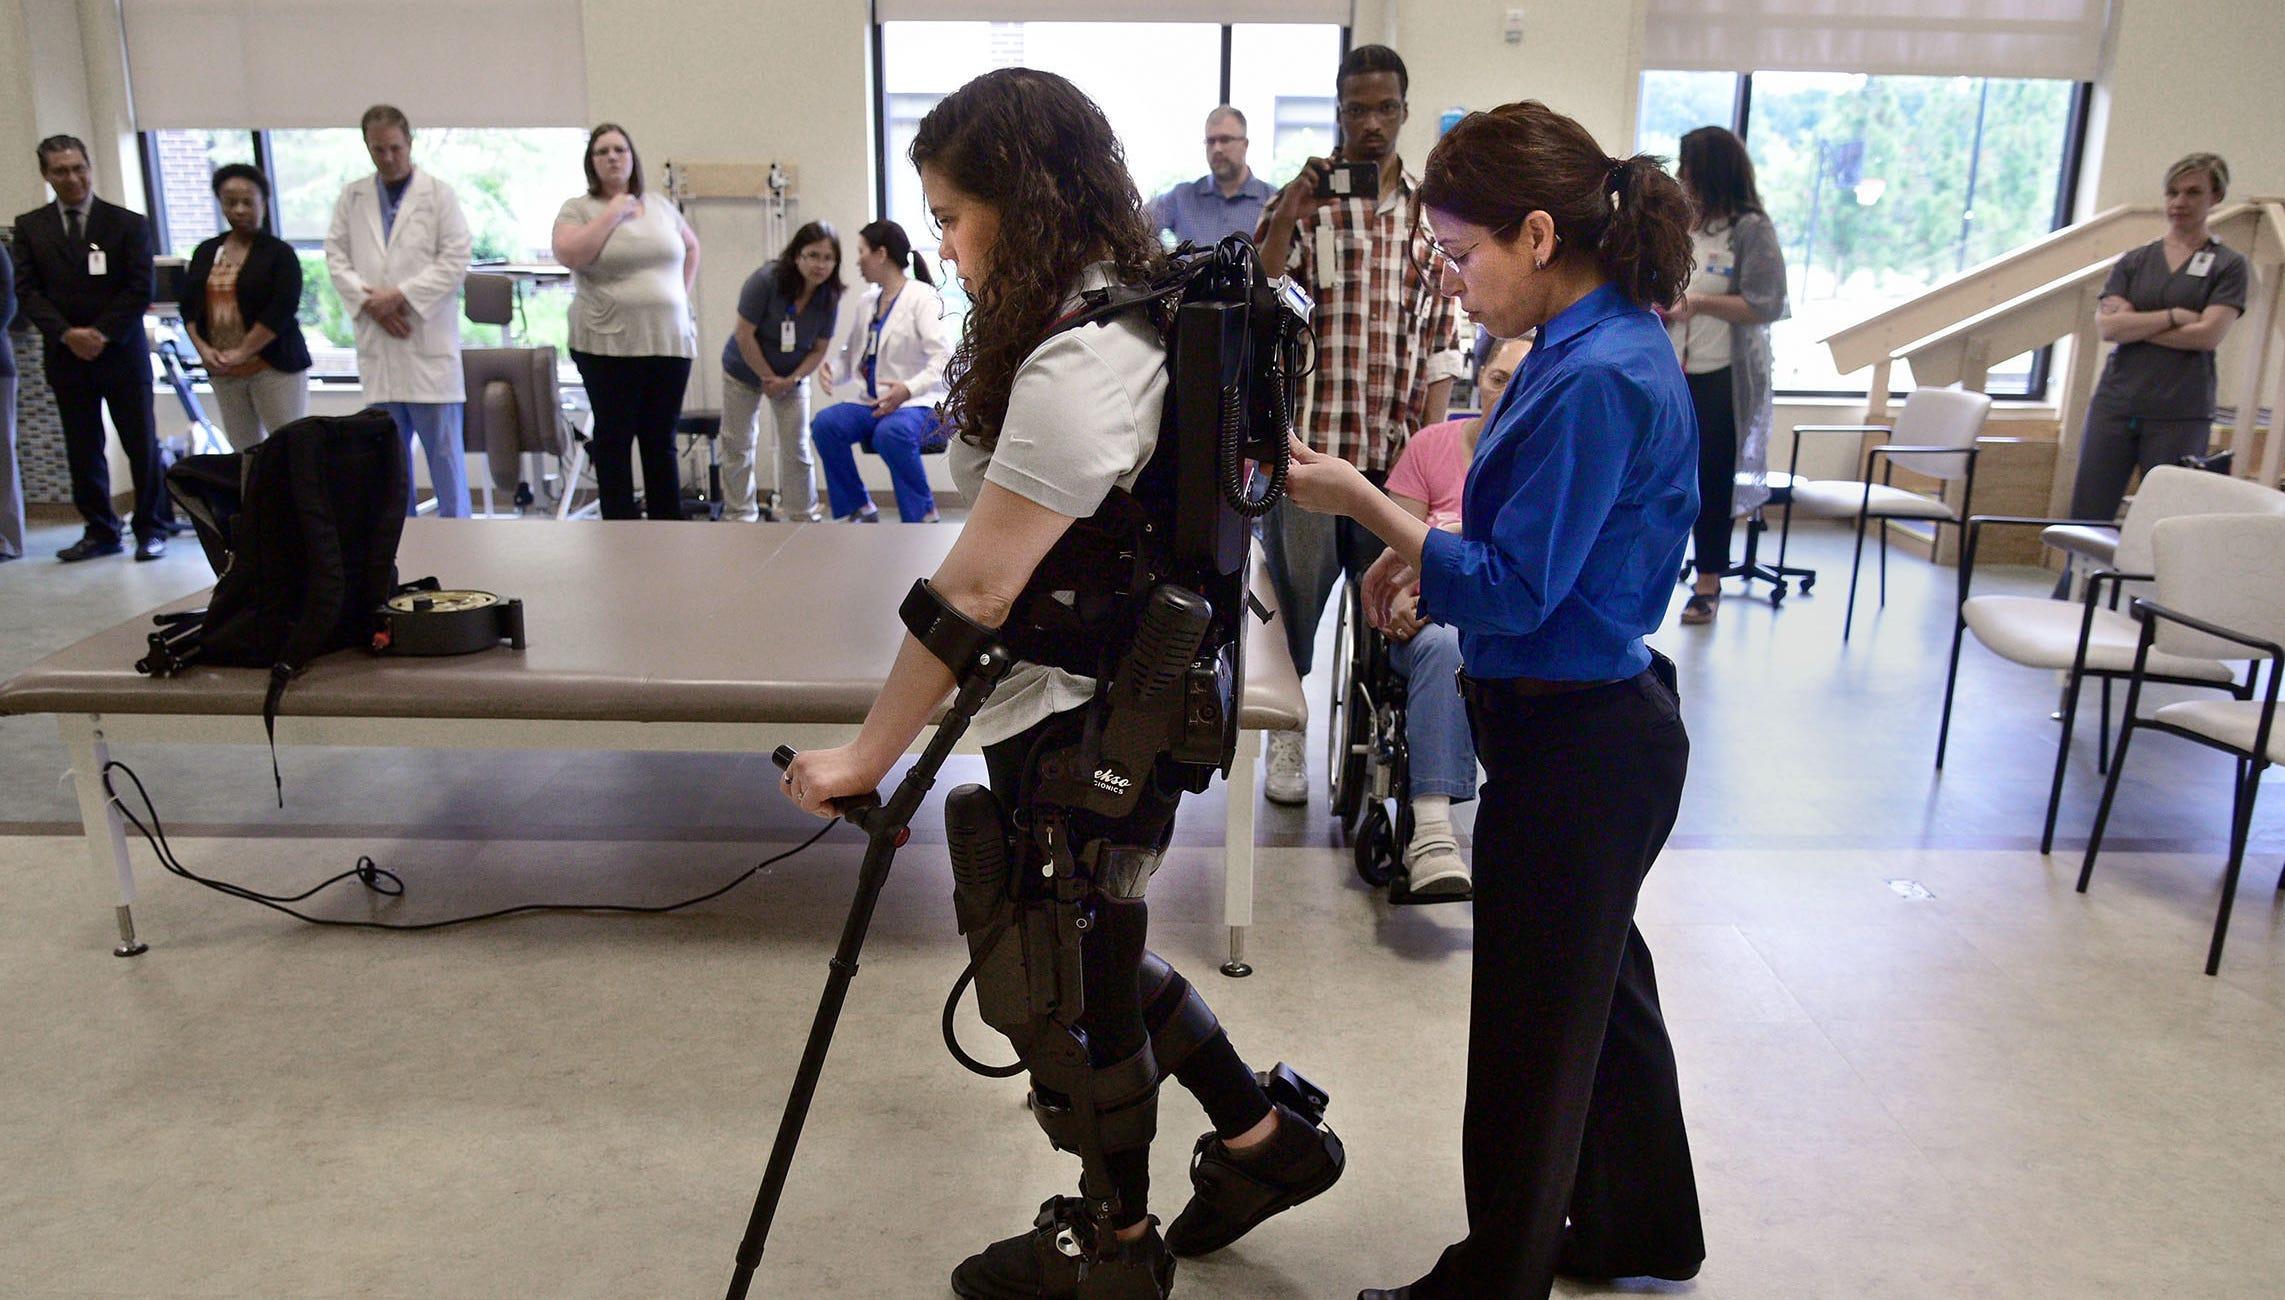 Germantown hospital gets robotic exoskeleton for stroke, spinal cord injury rehabilitation